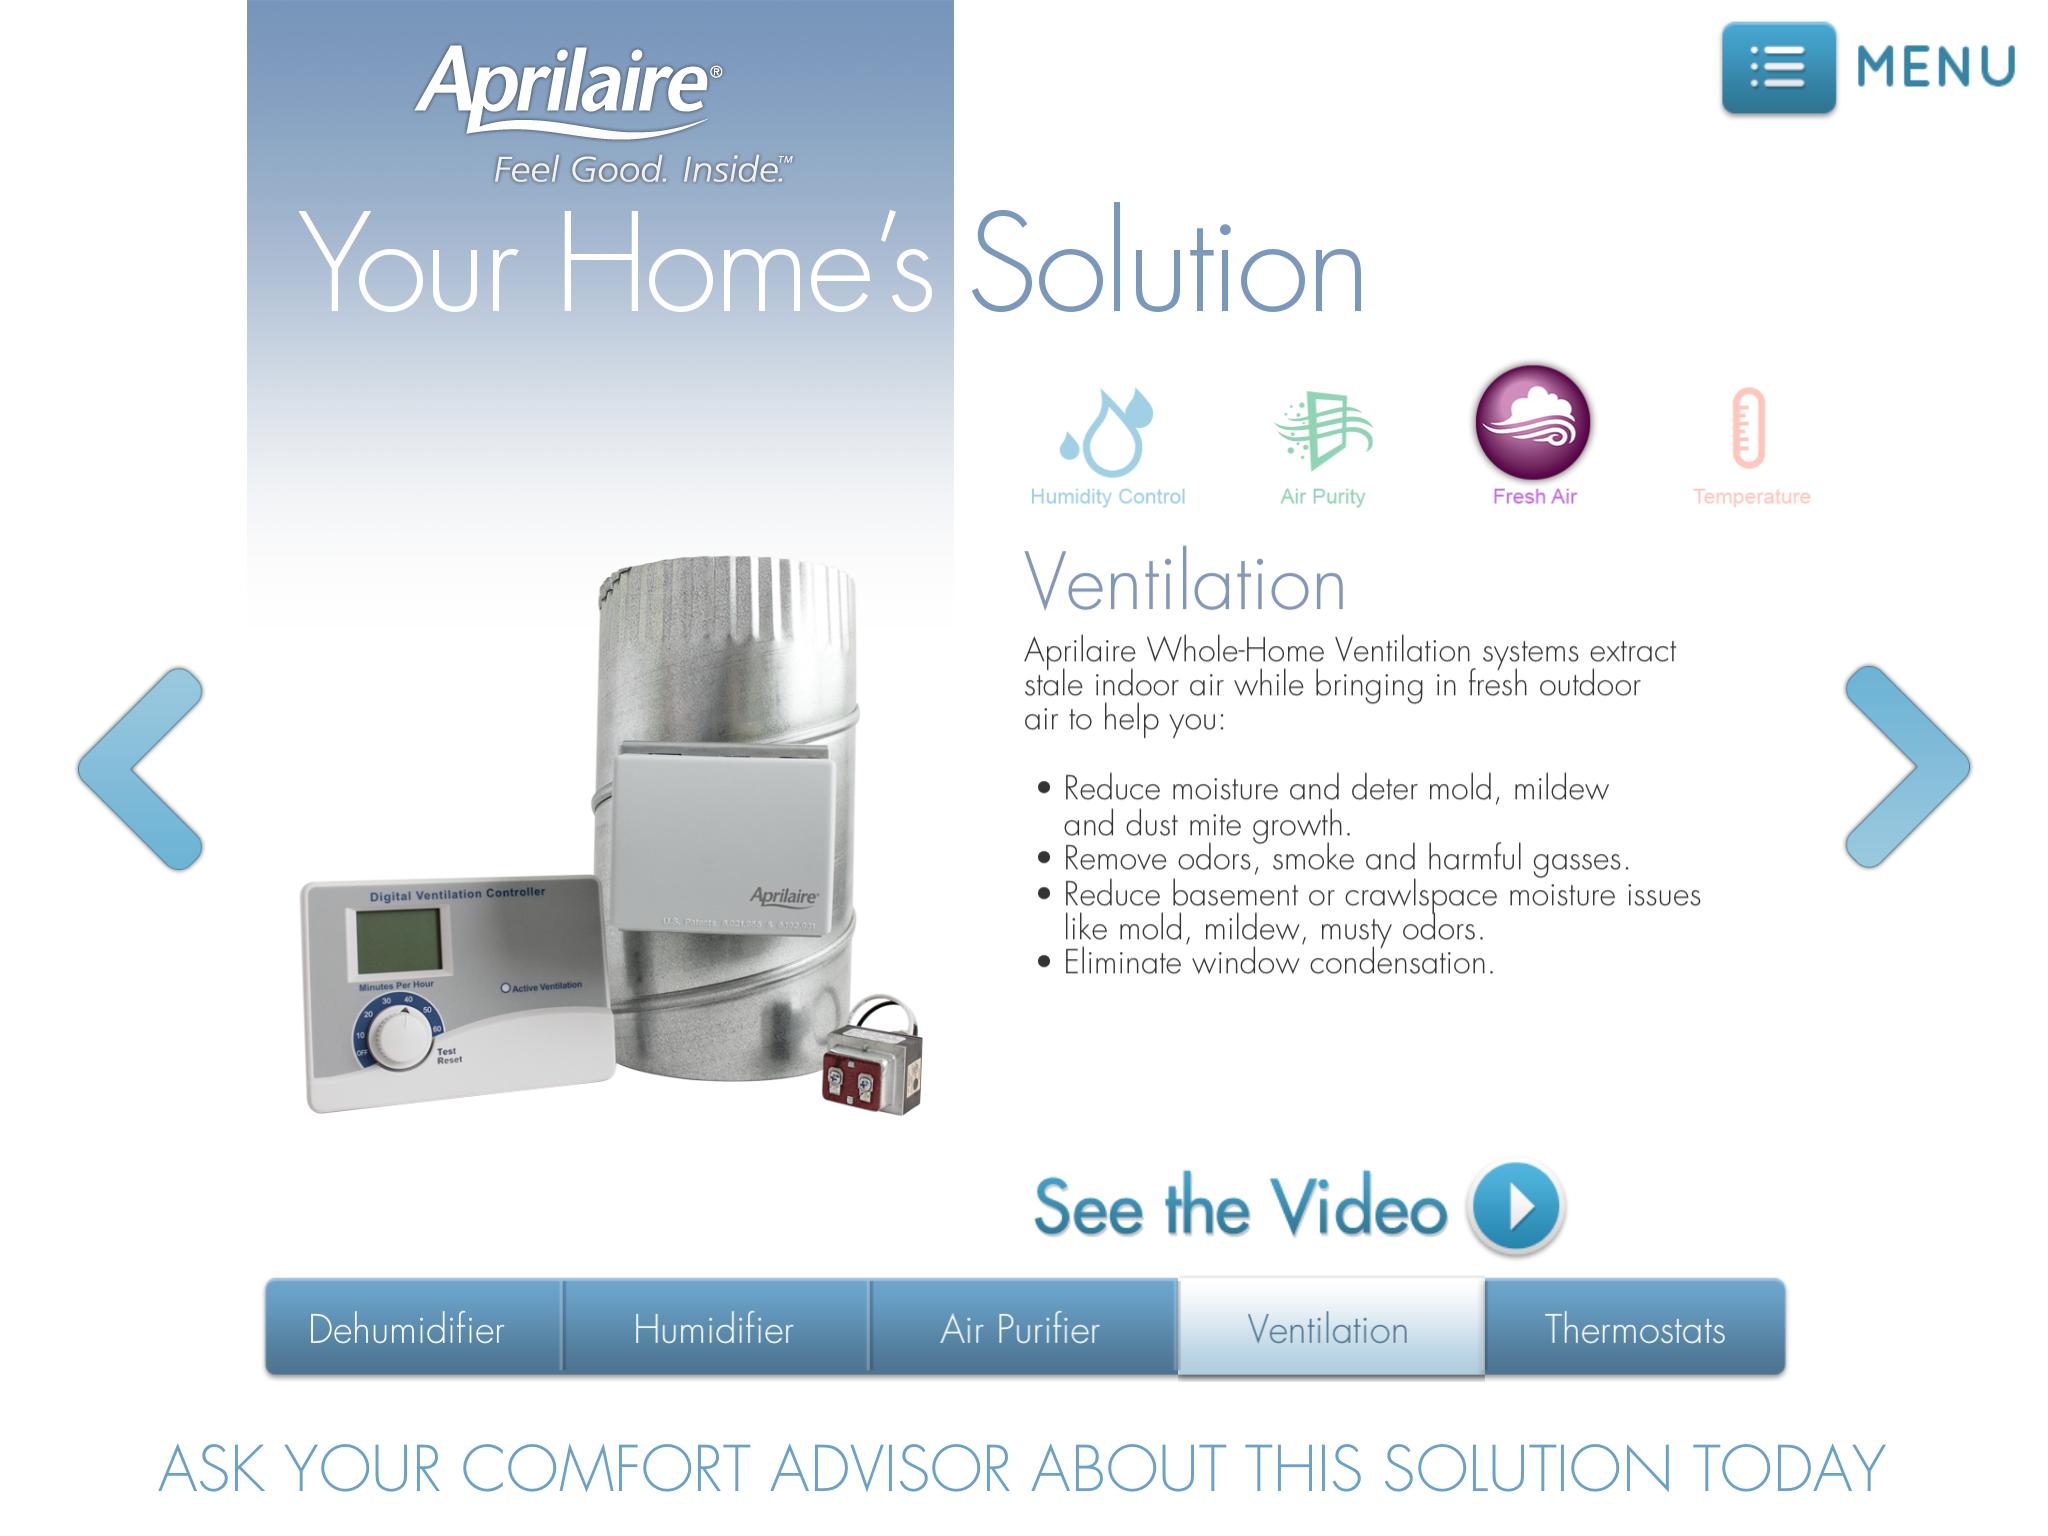 Aprilaire Comfort Advisor - Ventilation